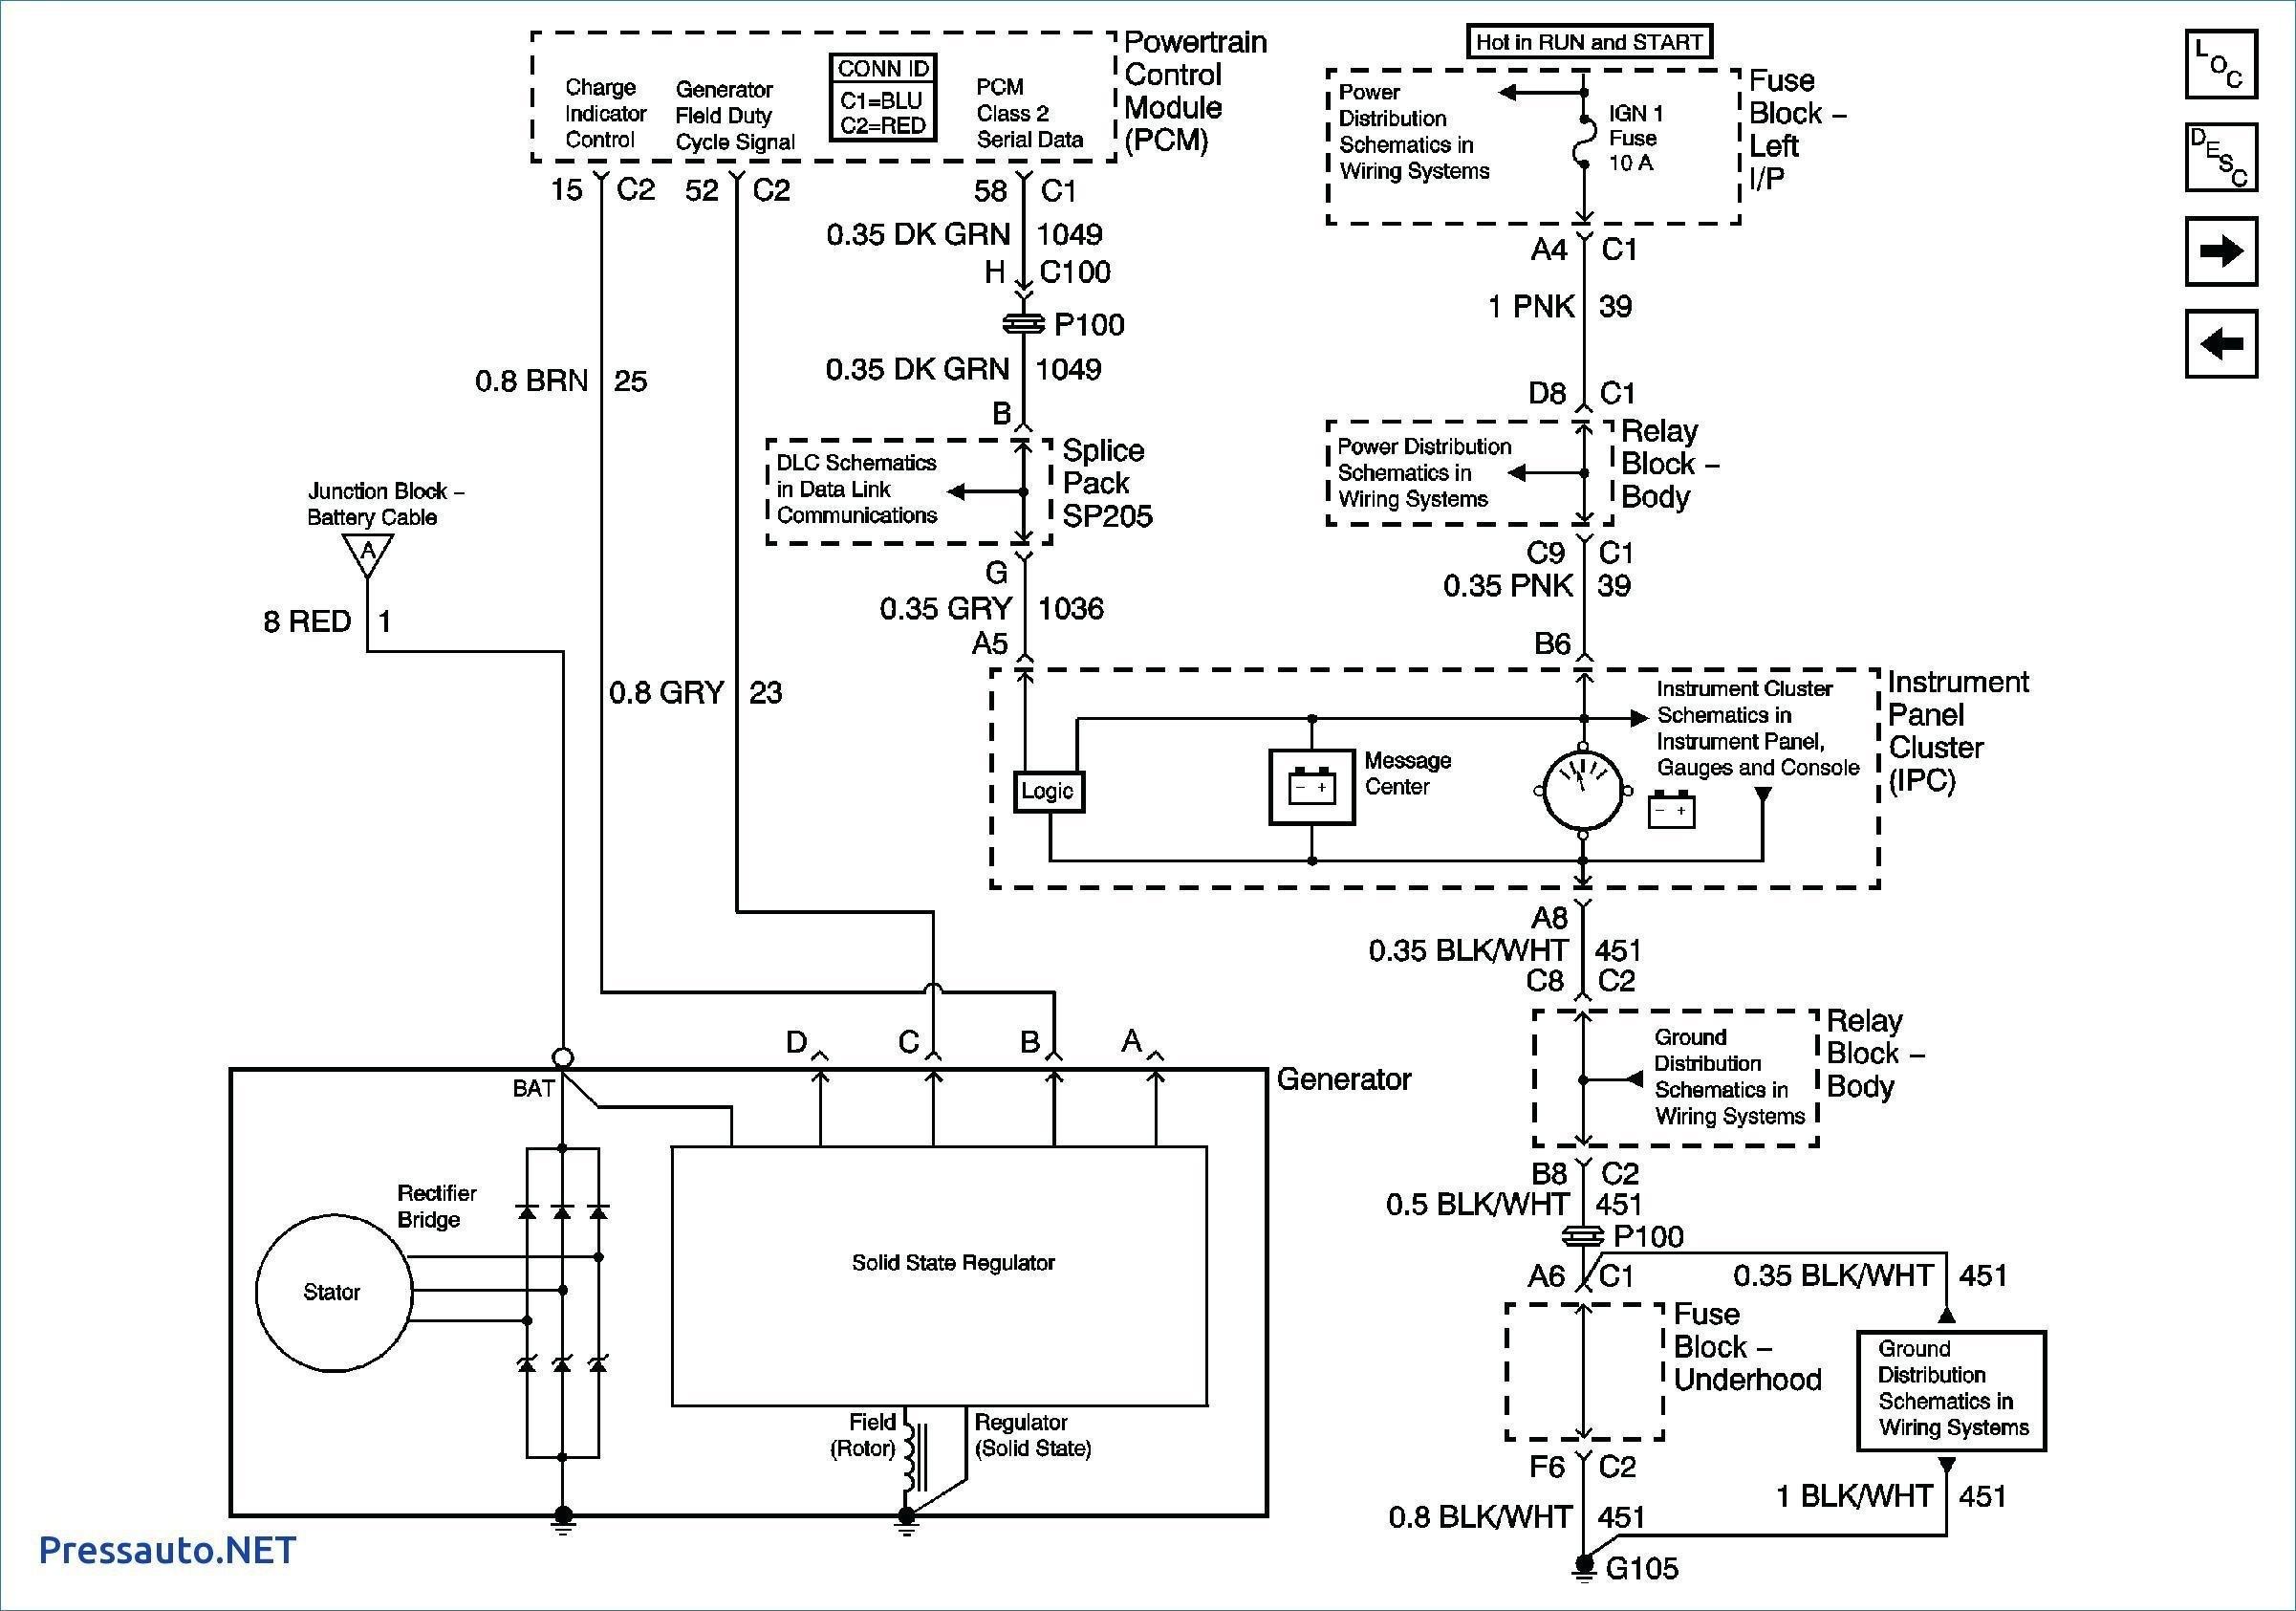 images?q=tbn:ANd9GcQh_l3eQ5xwiPy07kGEXjmjgmBKBRB7H2mRxCGhv1tFWg5c_mWT Automotive Wire Diagram Symbols